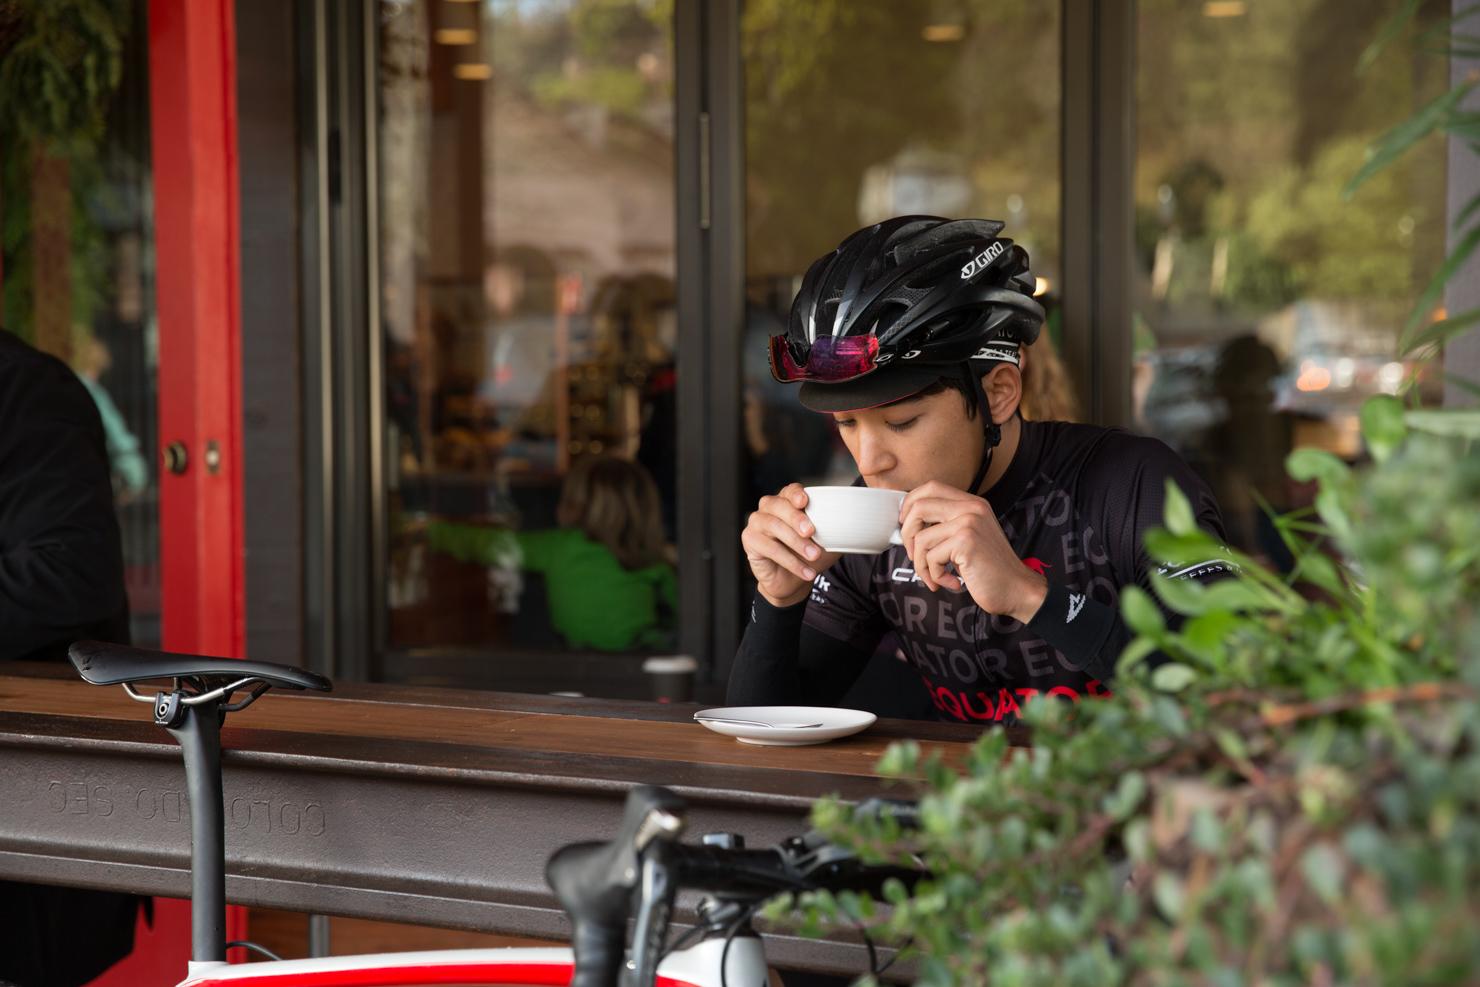 coffee cycling segafredo intelligentsia equator coffee and teas cafe culture bike racing team sprudge